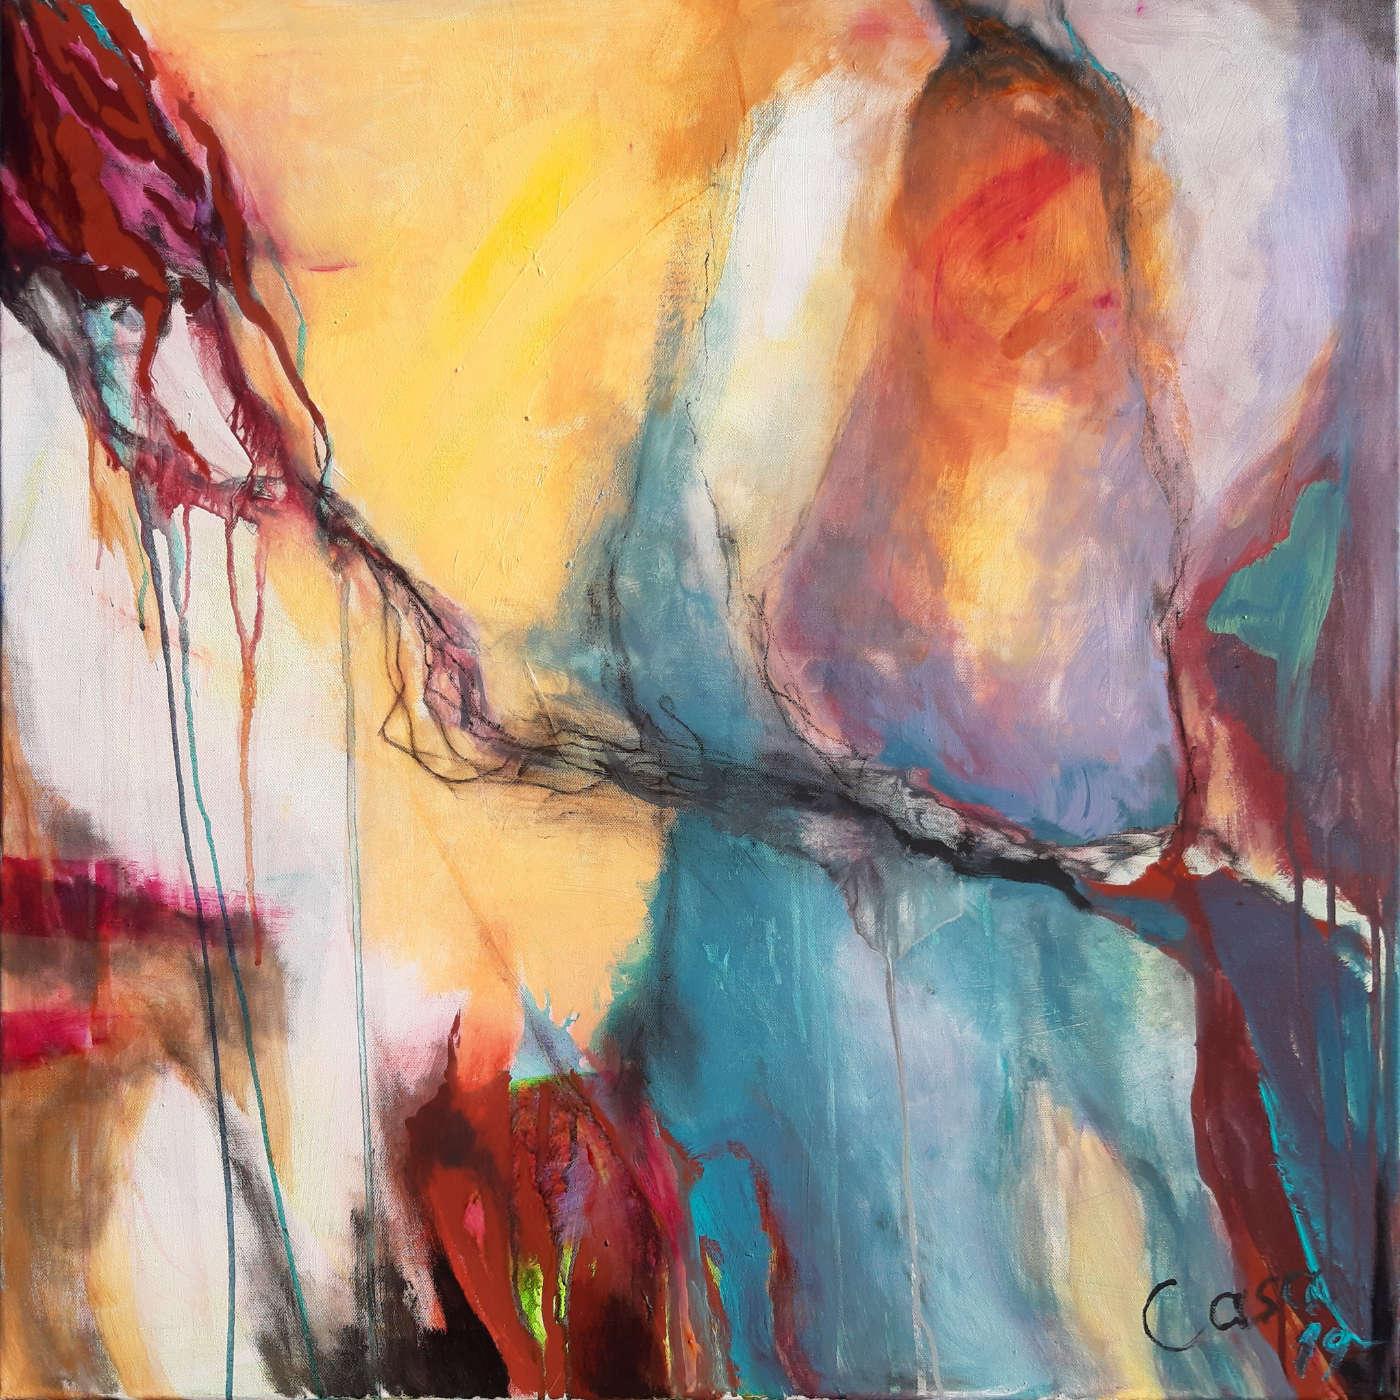 ohne Titel - Acryl, mixed media auf Leinwand, 80 x 80 cm